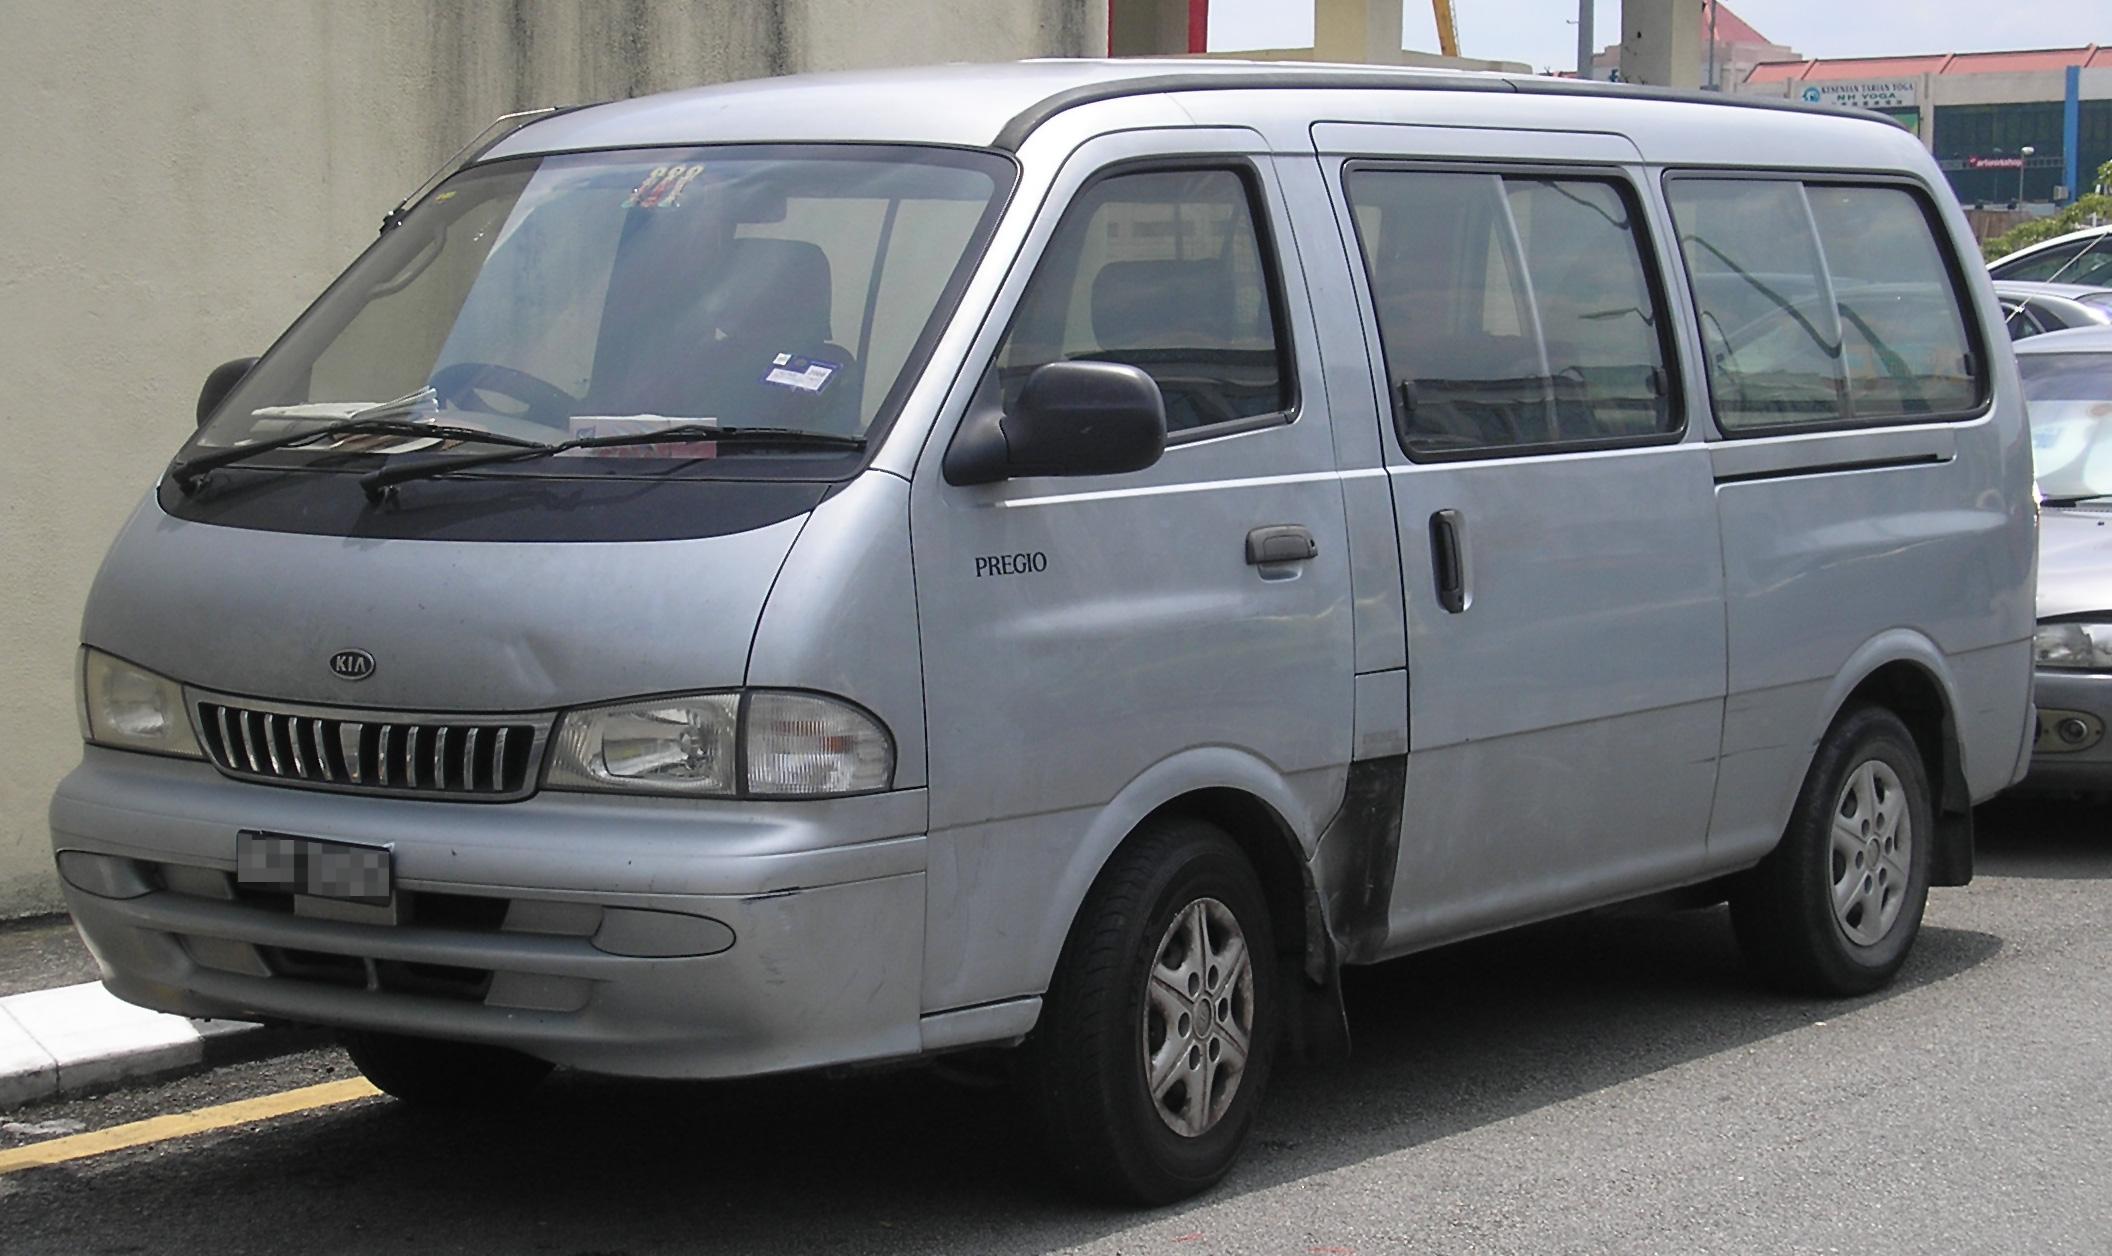 File:Kia Pregio (first generation) (front), Serdang.jpg - Wikimedia